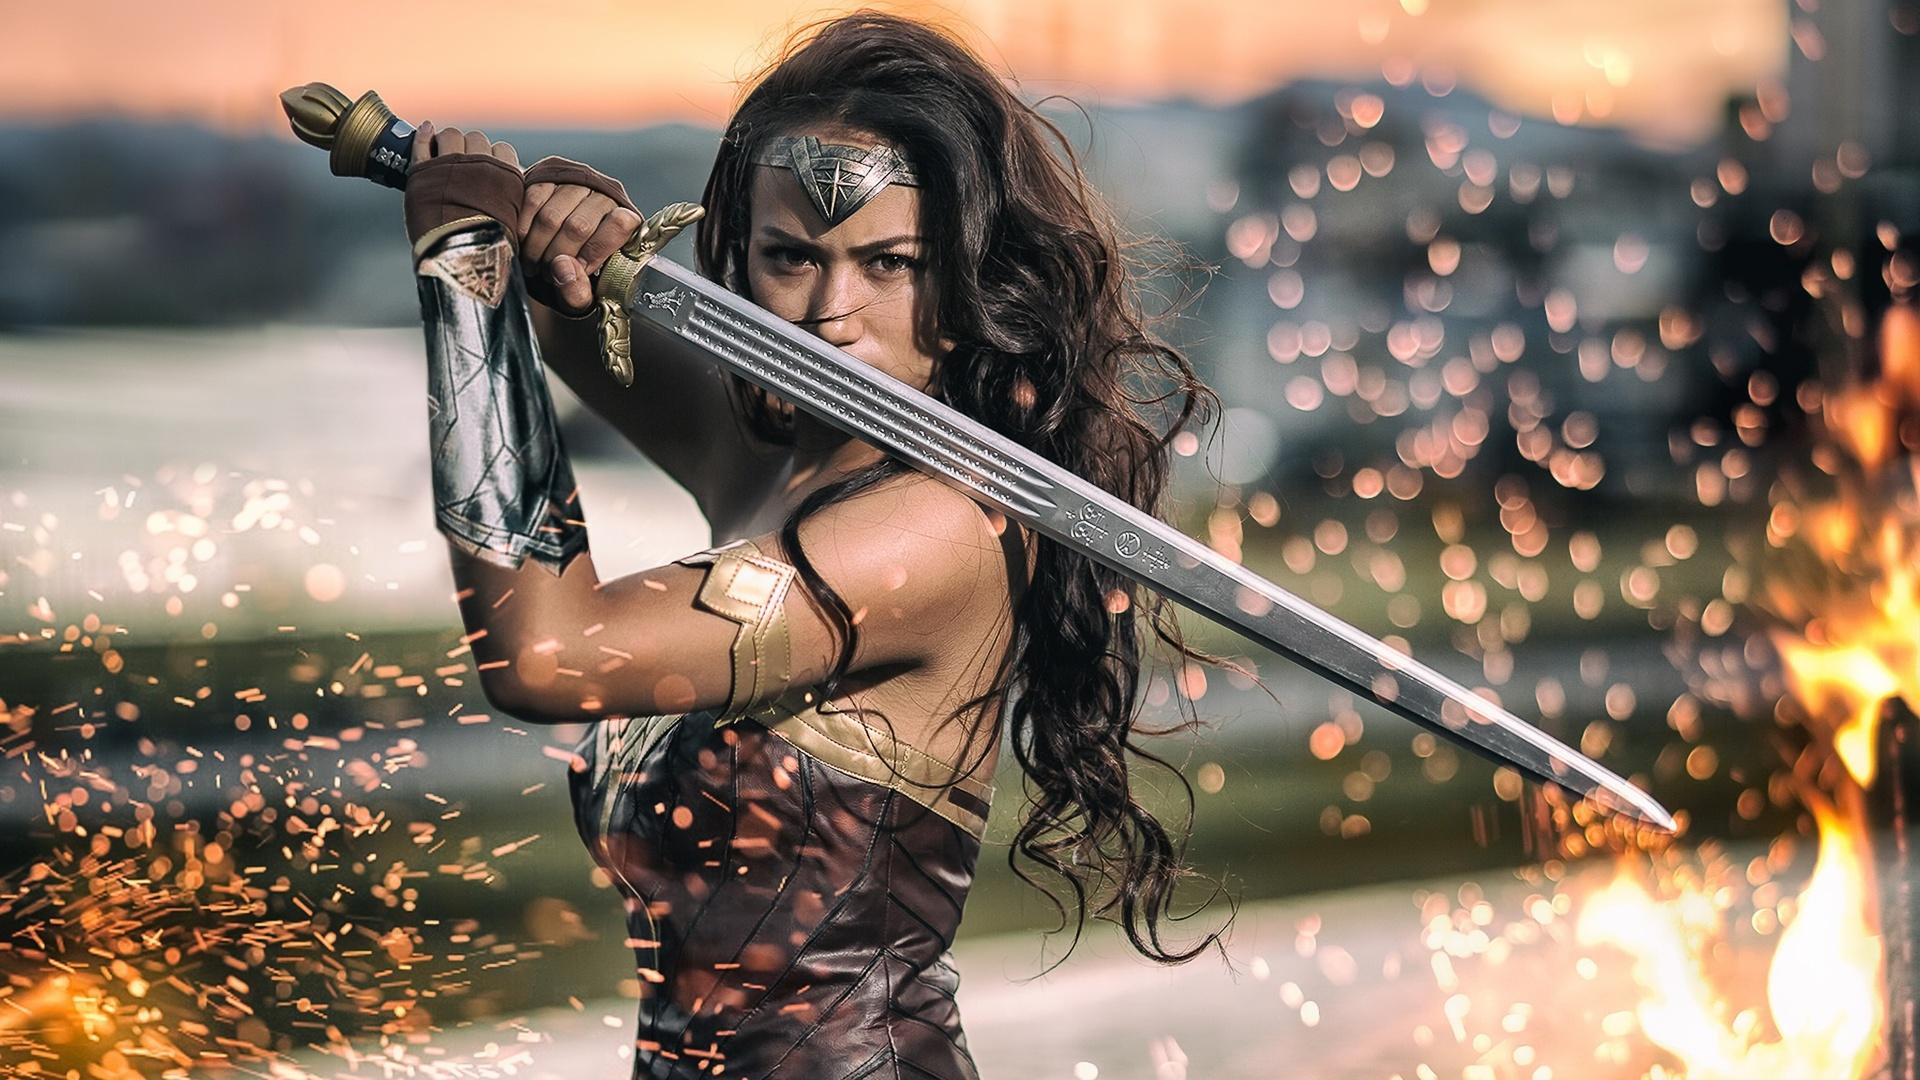 Wonder Woman 2017 Wallpaper Full Hd Free Download: 1920x1080 Wonder Woman Cosplay 2017 Laptop Full HD 1080P